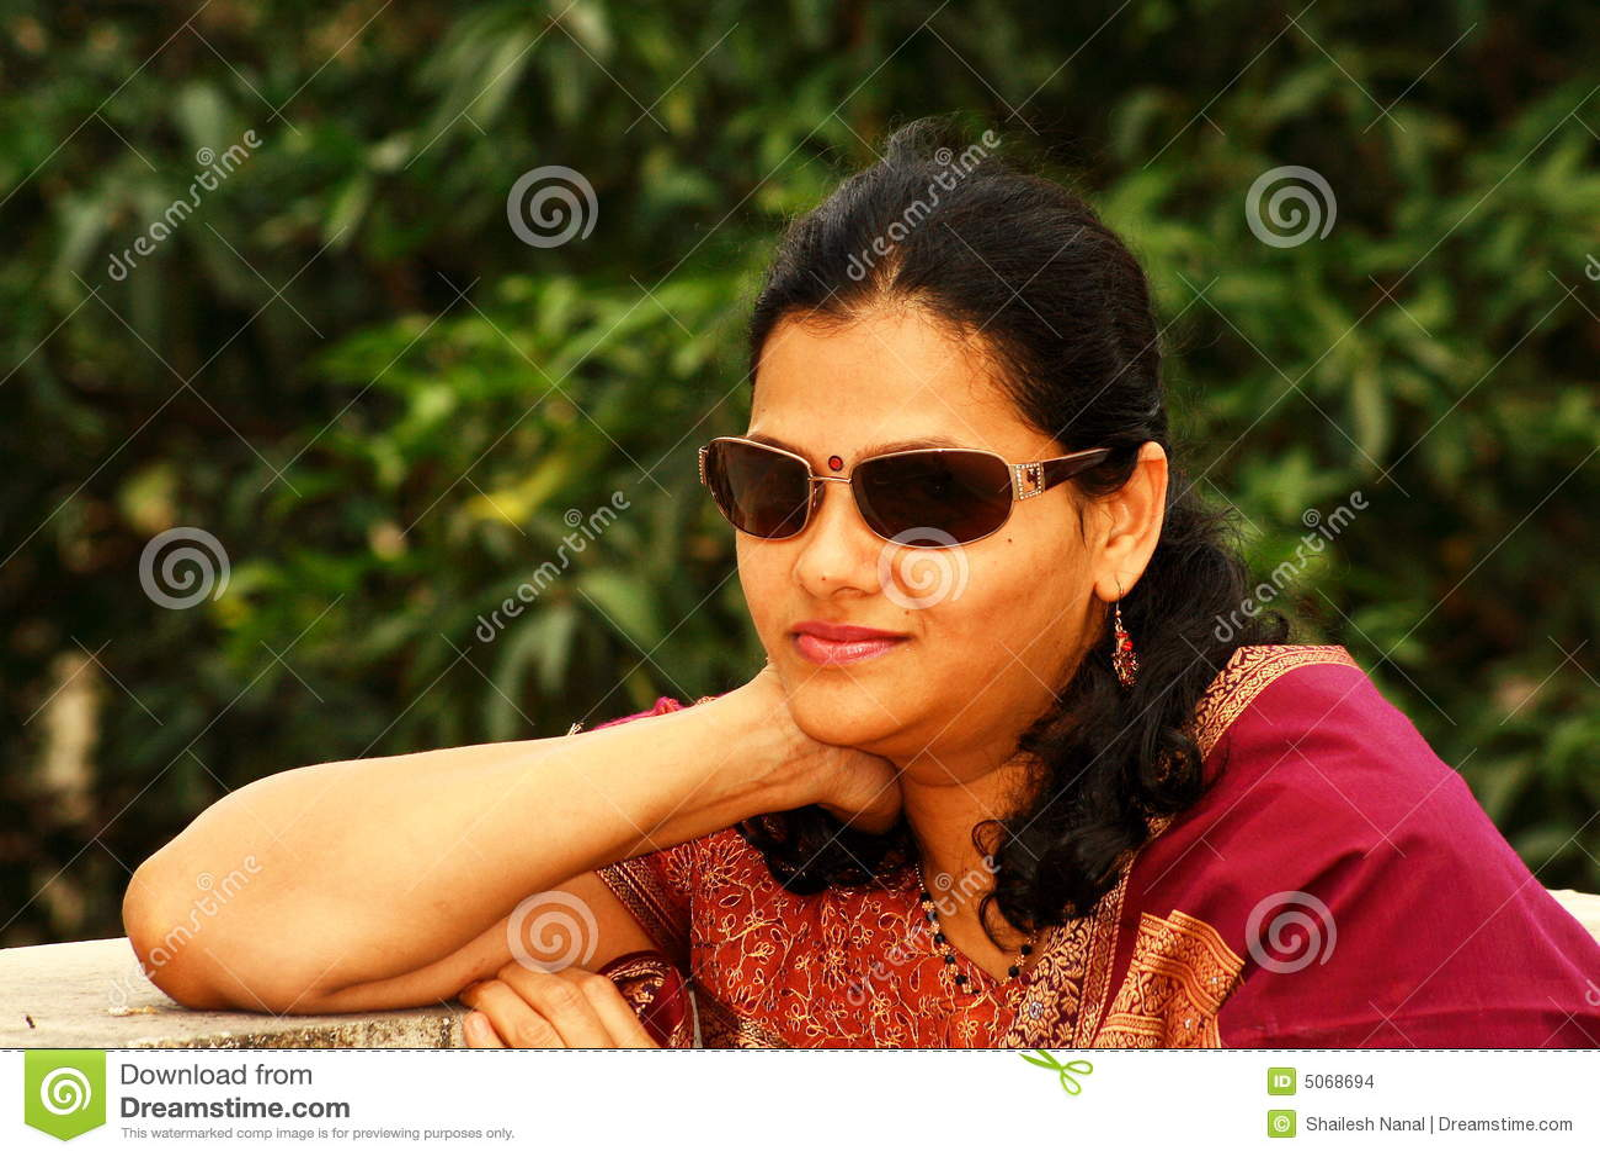 el palito hindu singles Hindu dating, hindu matrimonial, hindu marriage, free site, wedding, dating, canada, uk, religion, indian, temple, brahmin, love.